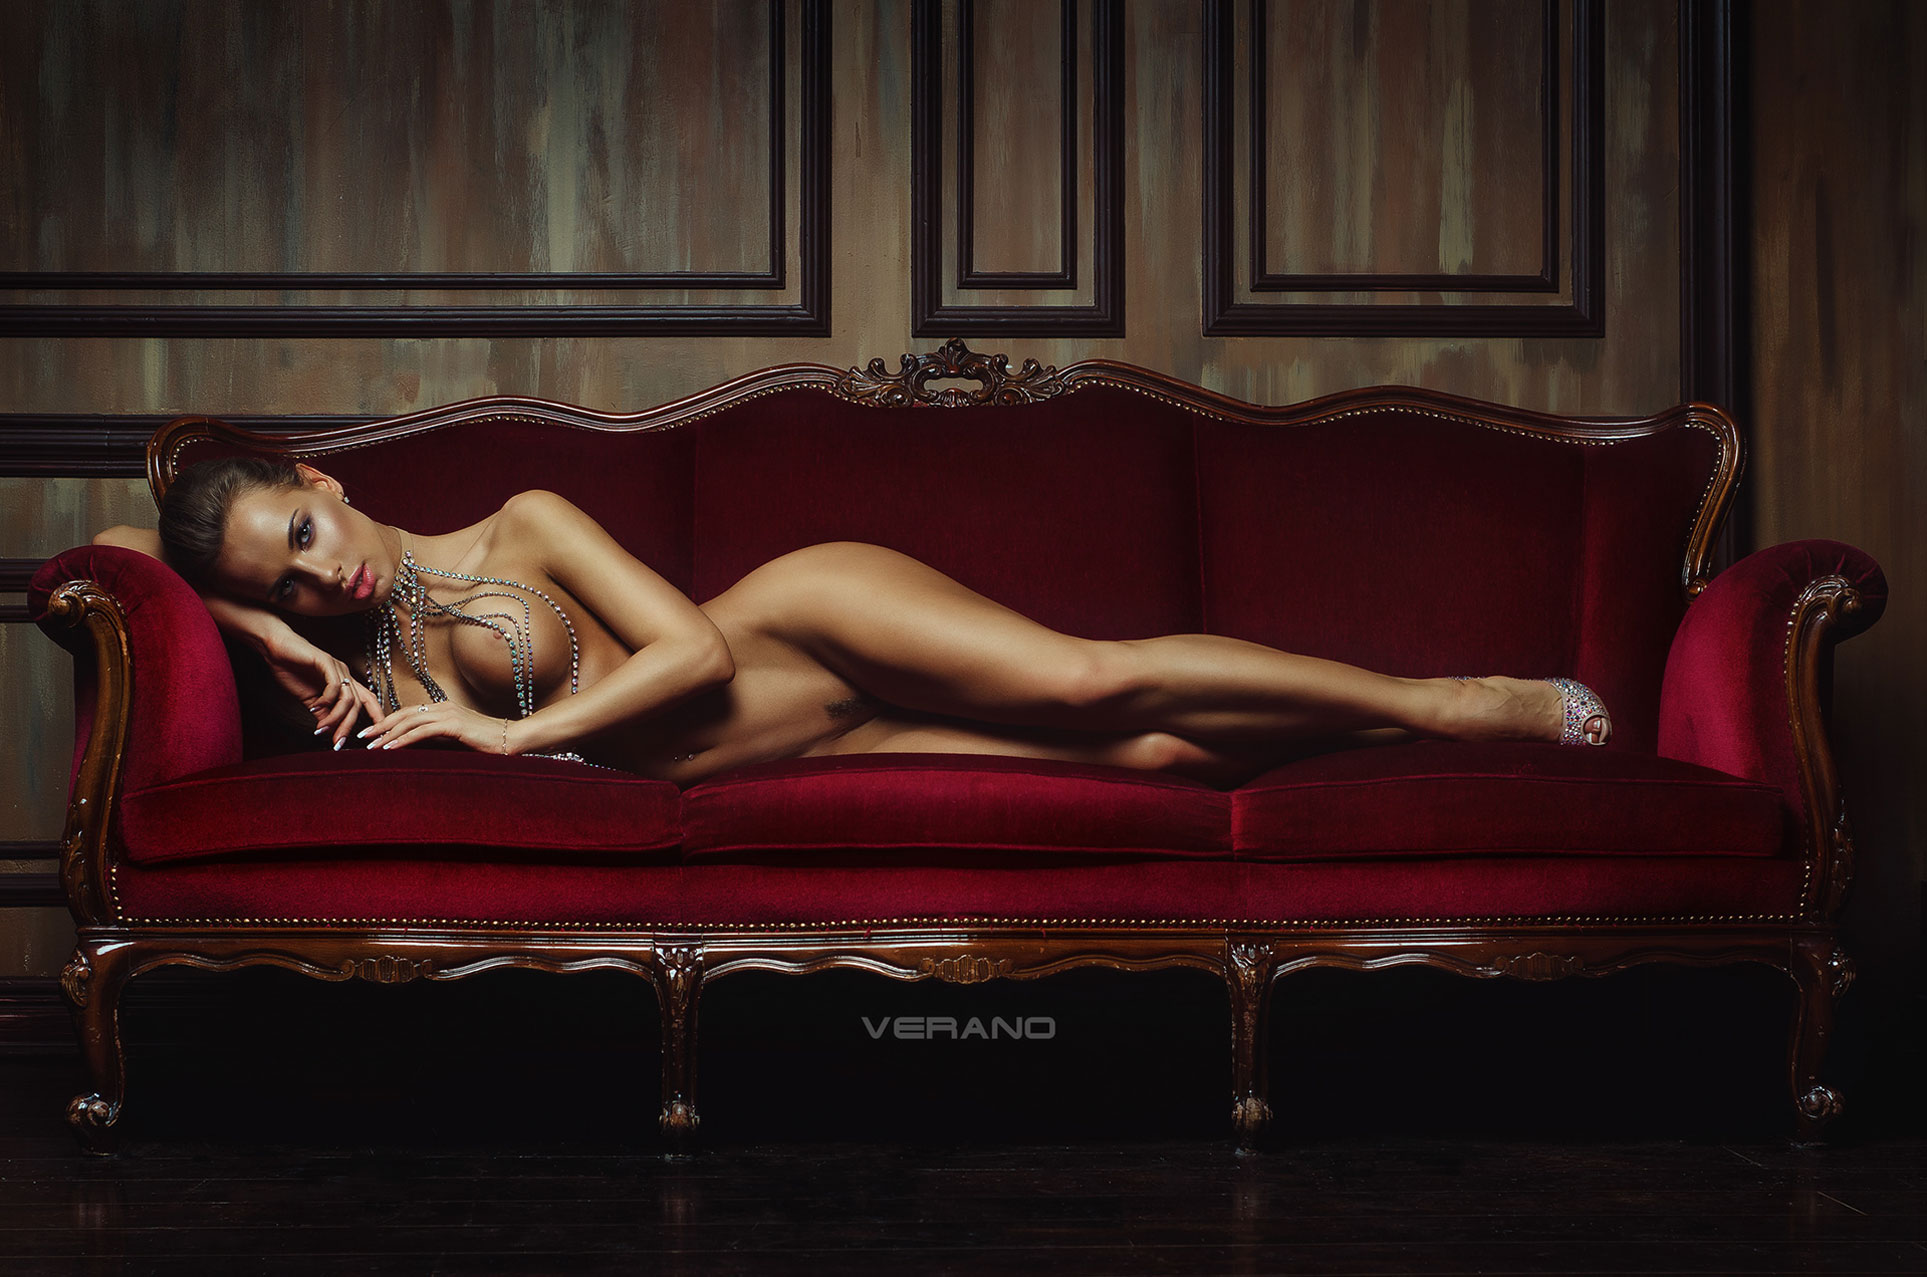 Катерина Кристалл / Katerina Kristall by Nikolas Verano